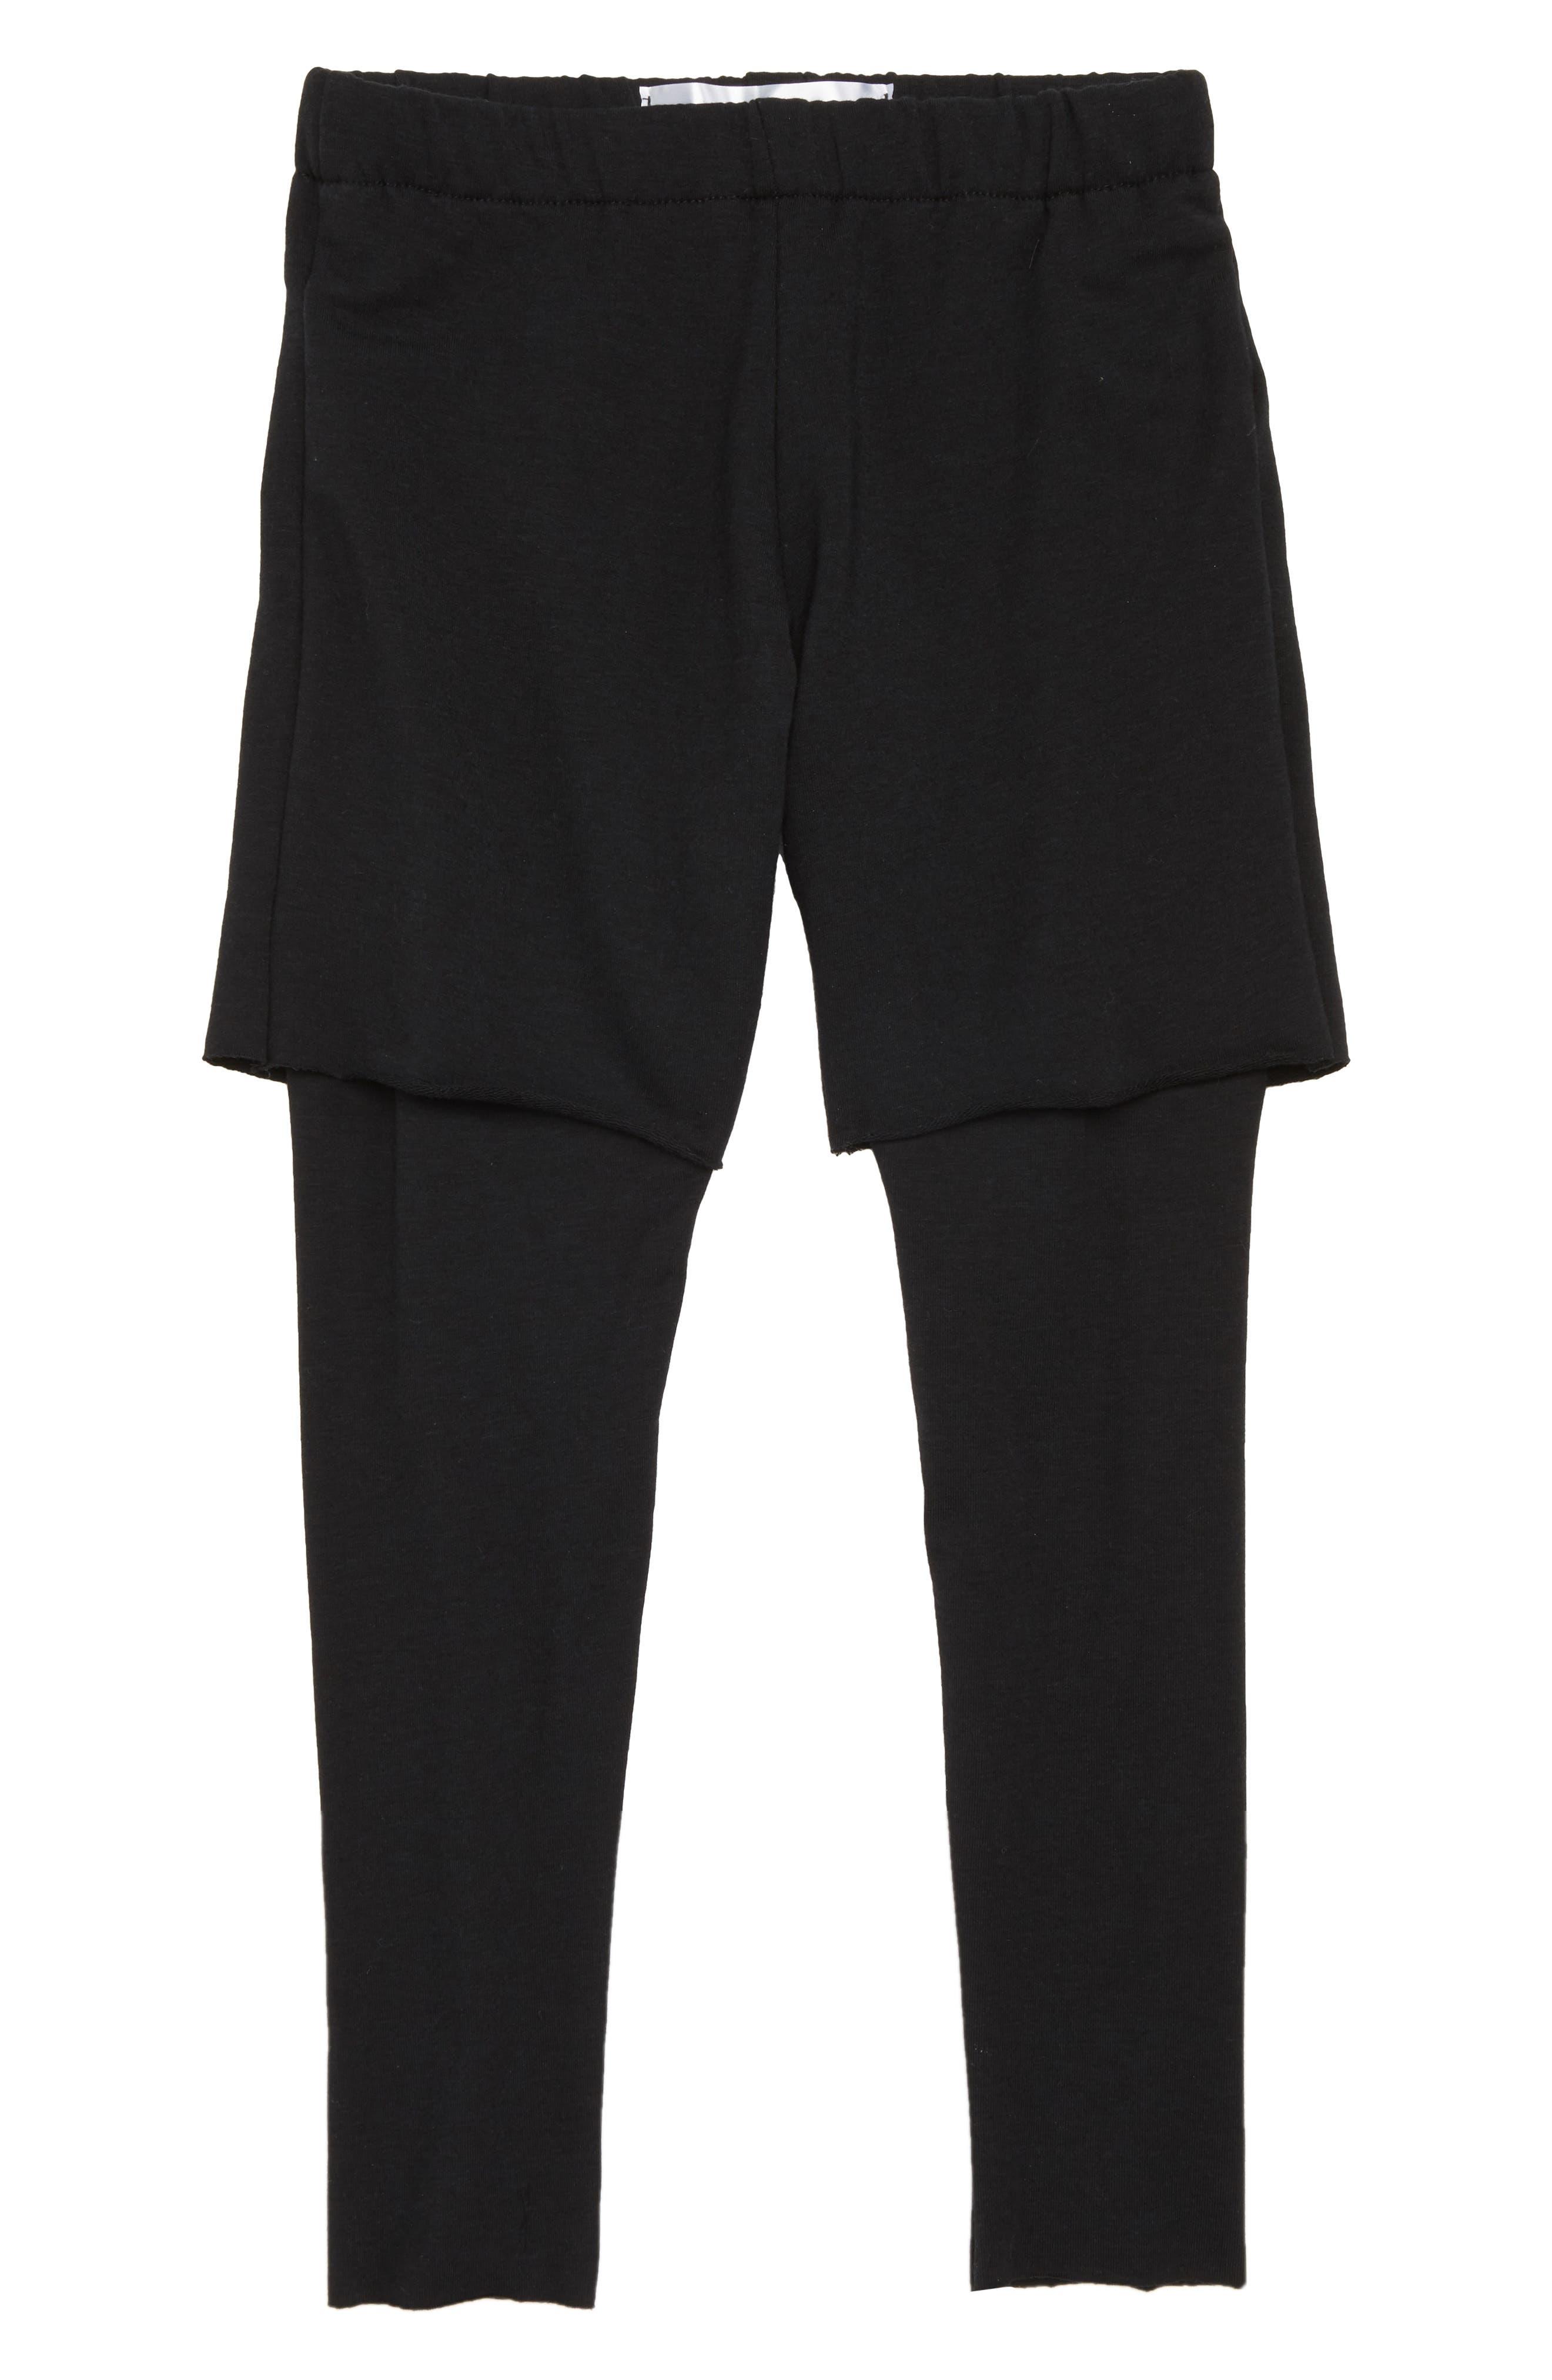 Pants,                             Main thumbnail 1, color,                             Black